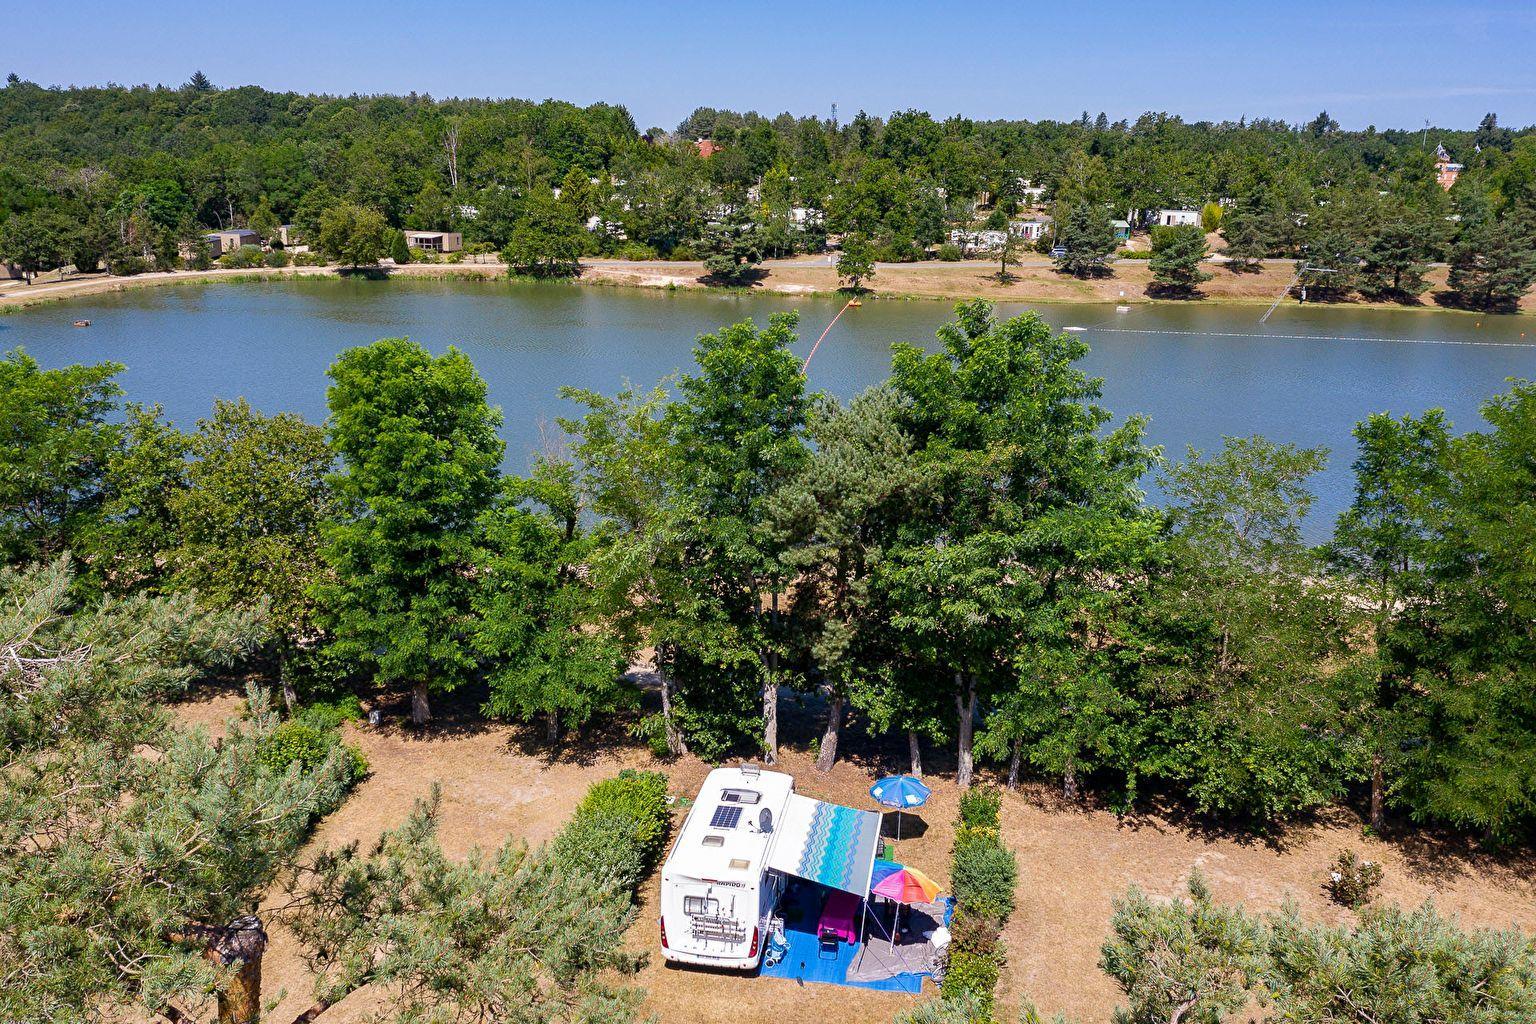 Emplacement - Forfait Bord De Lac **** - Camping Sandaya Les Alicourts Resort